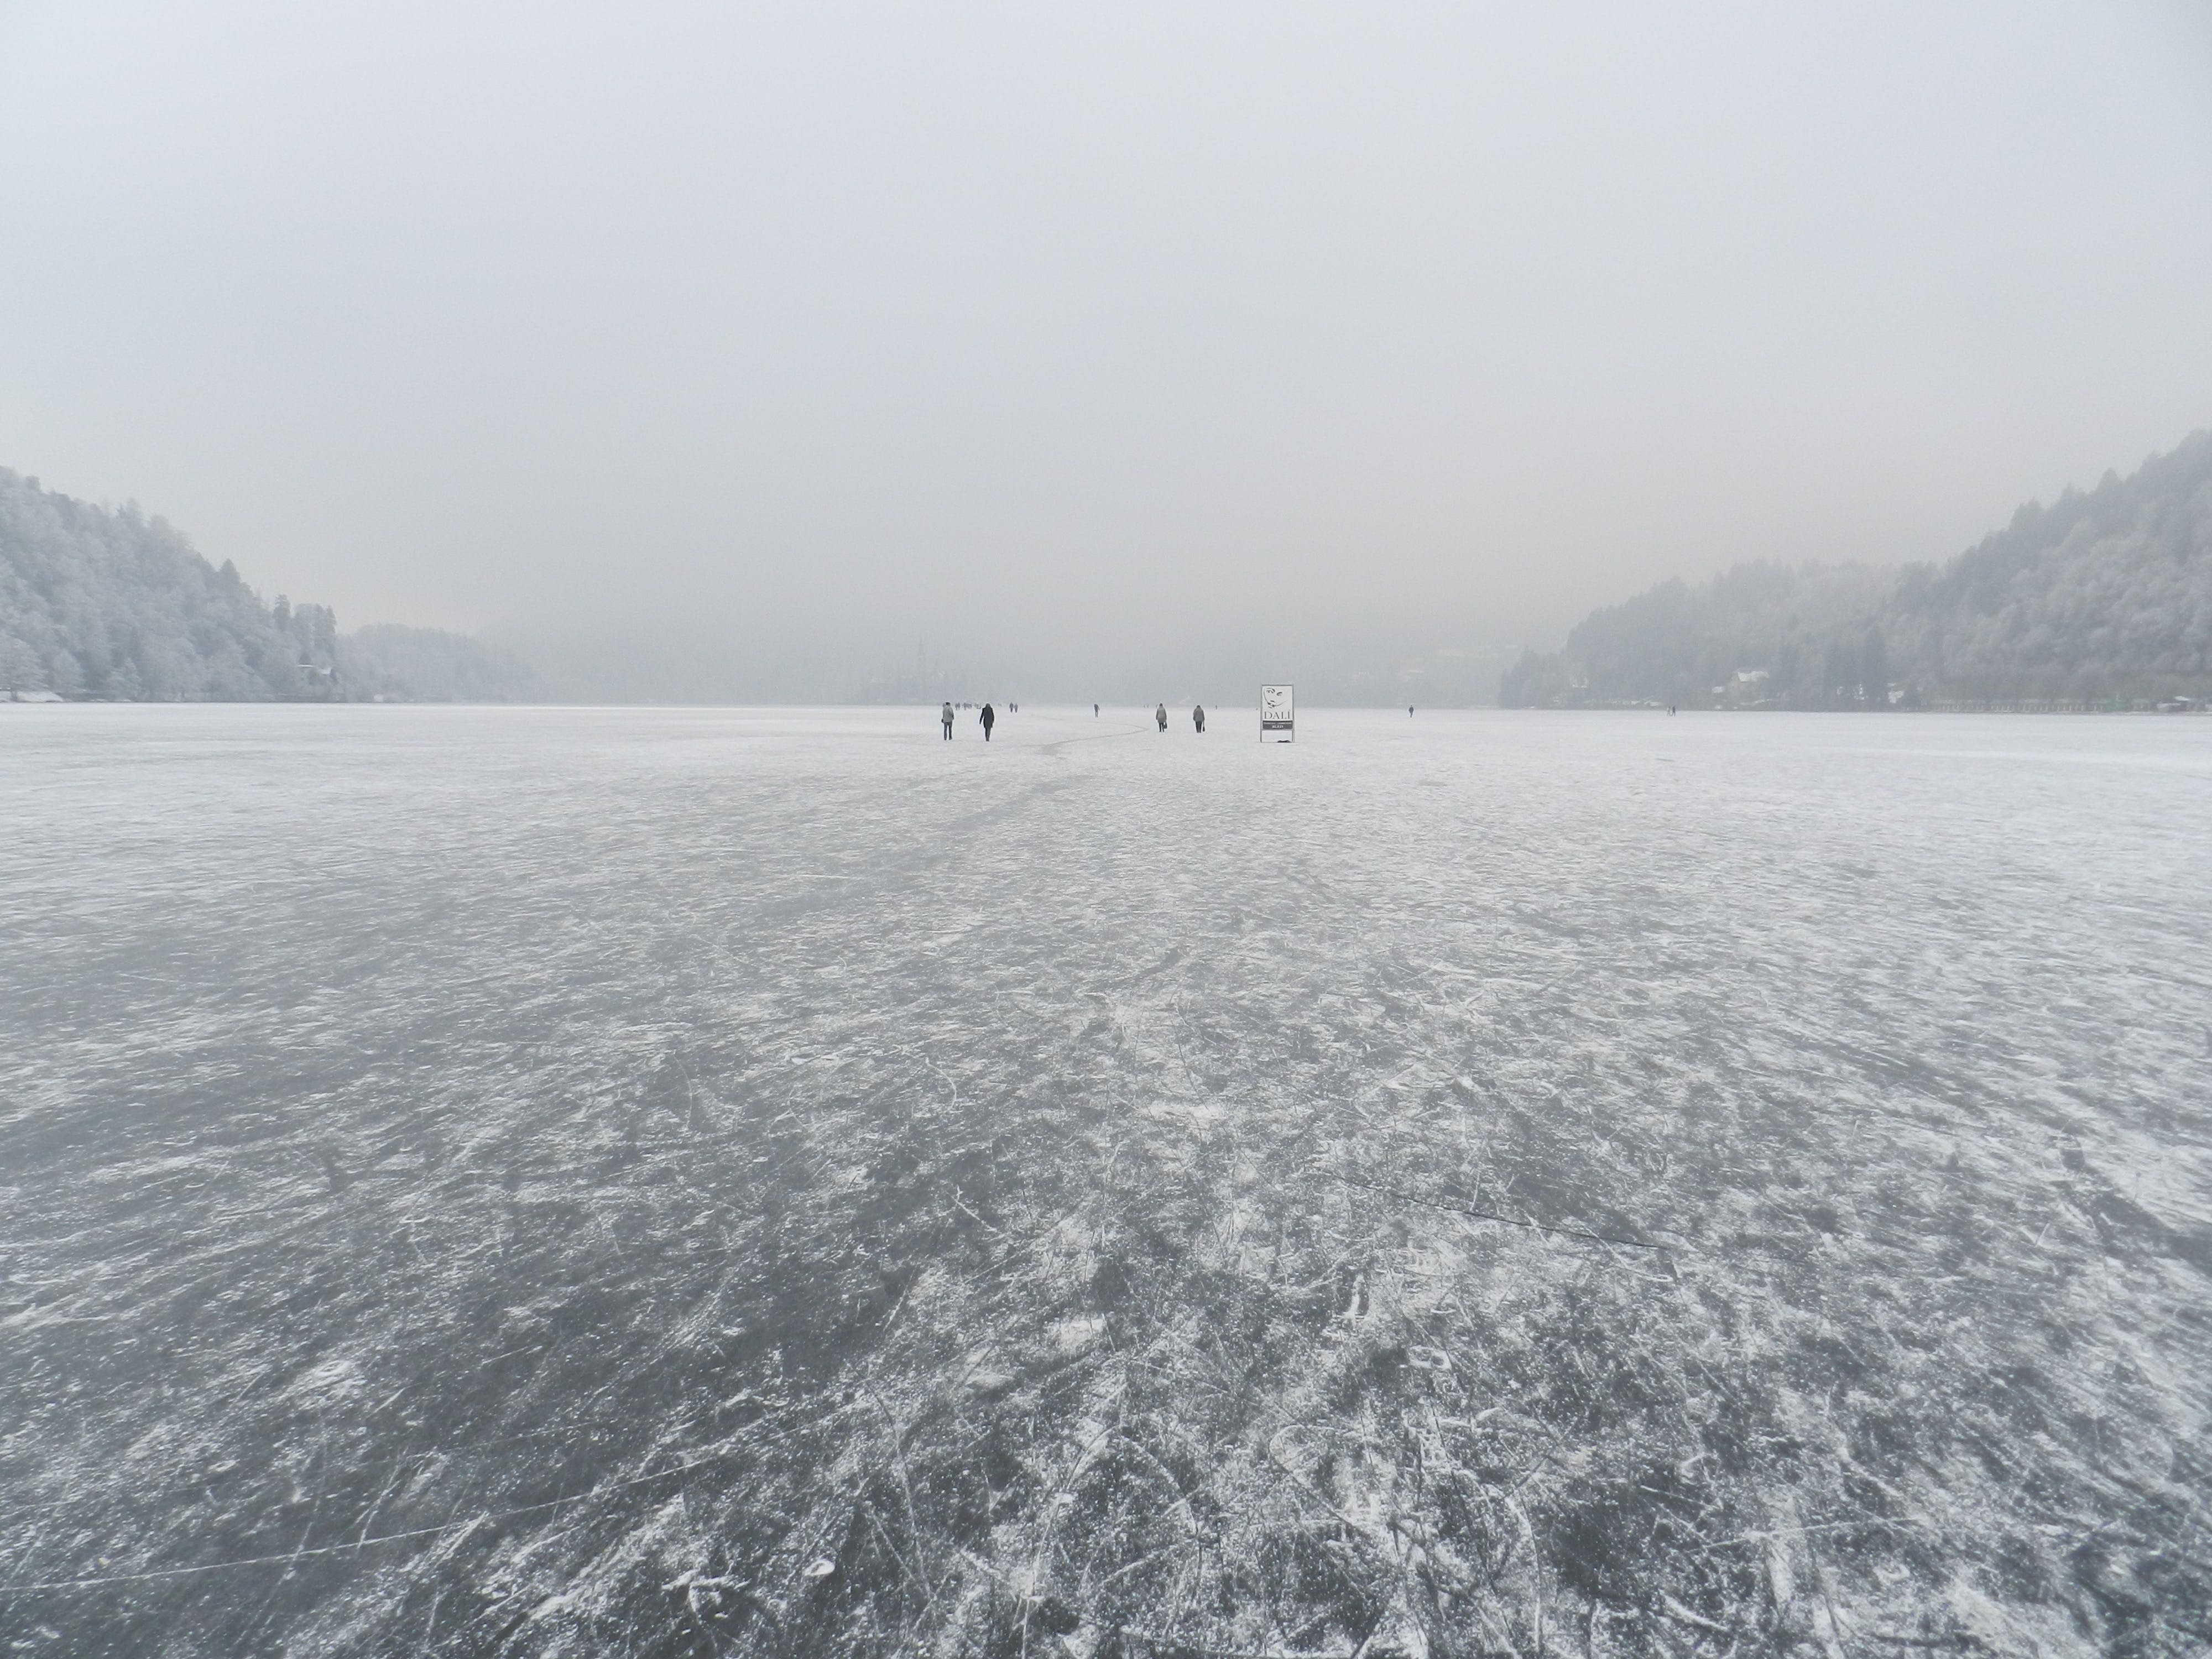 People Standing on Icerberg